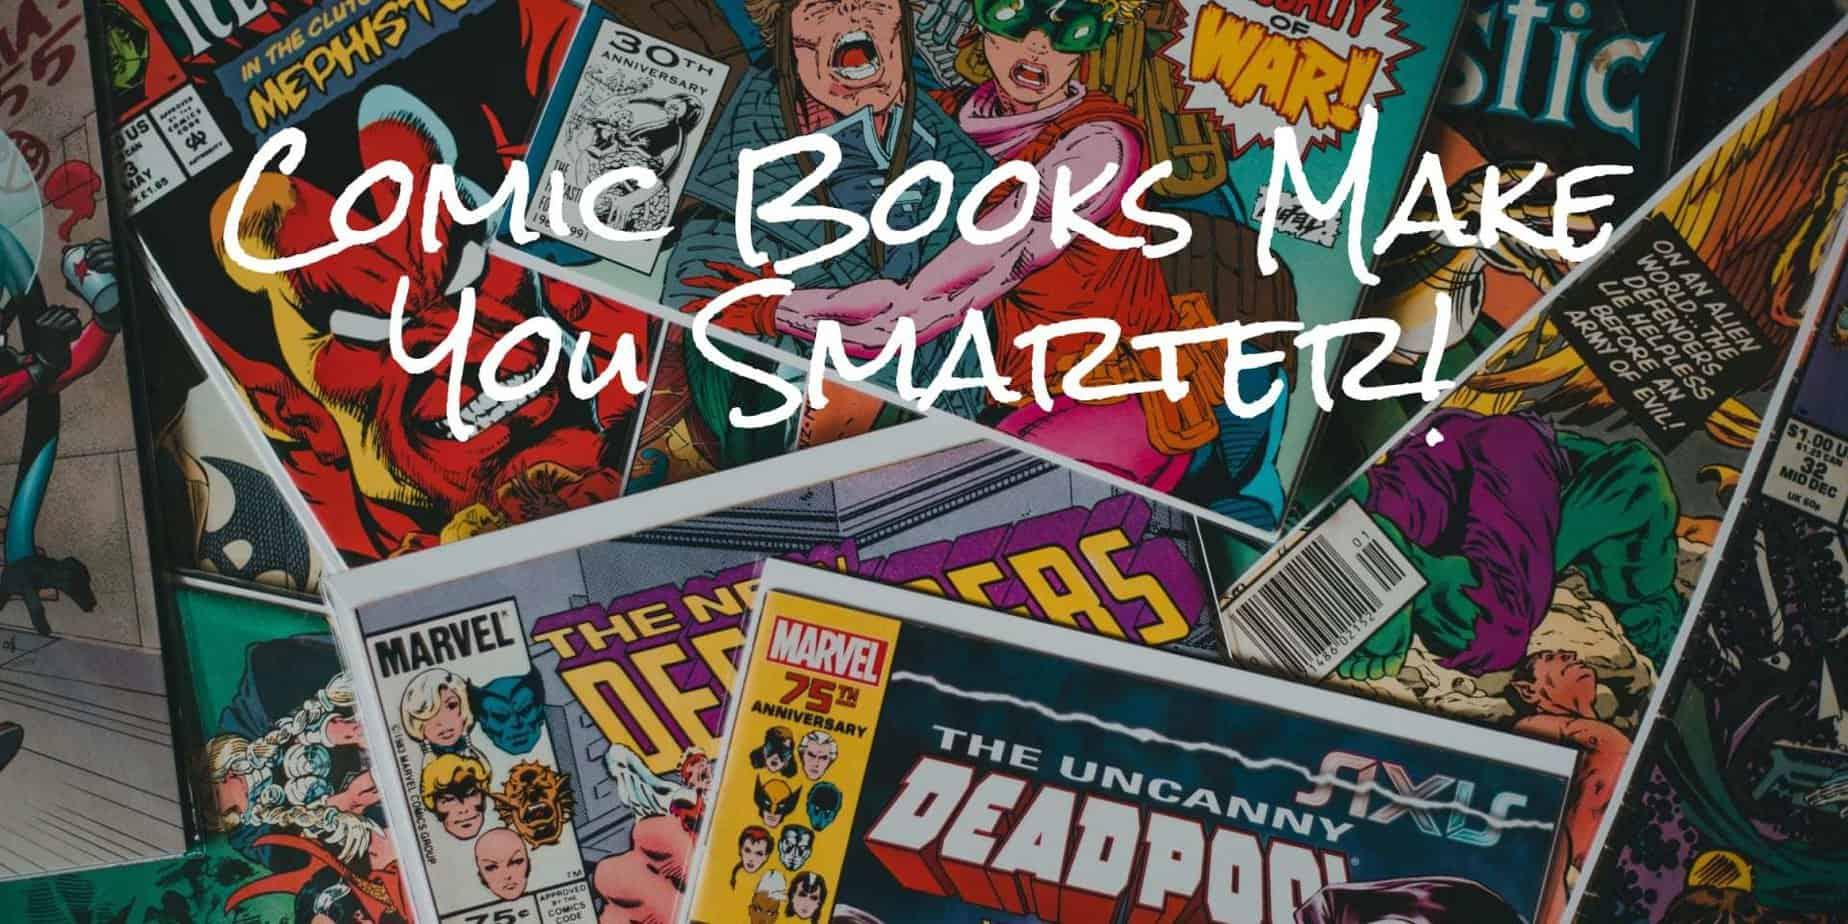 Comic books make you smarter